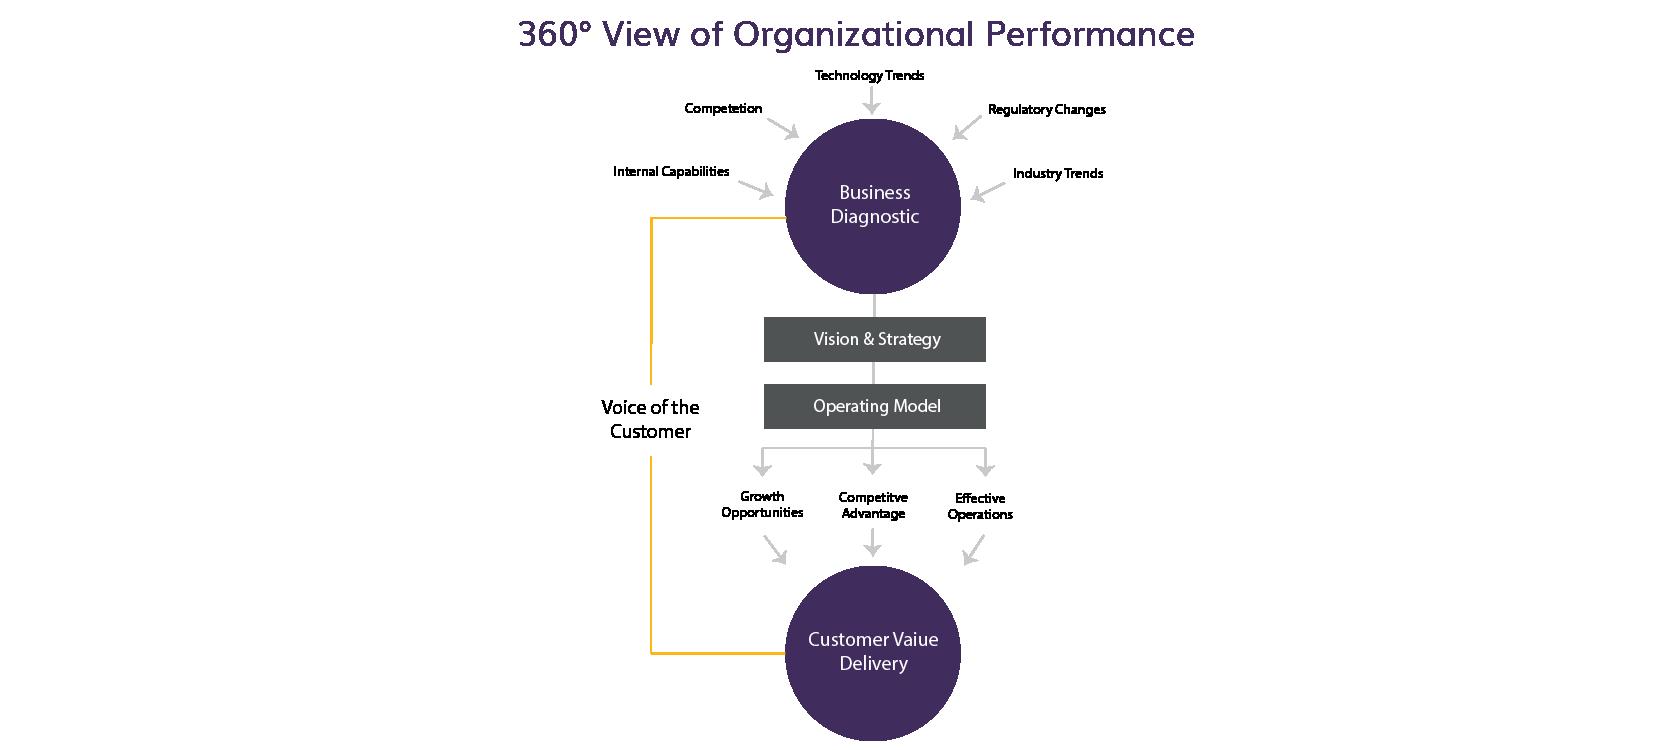 360 Degree View of Organizational Performance